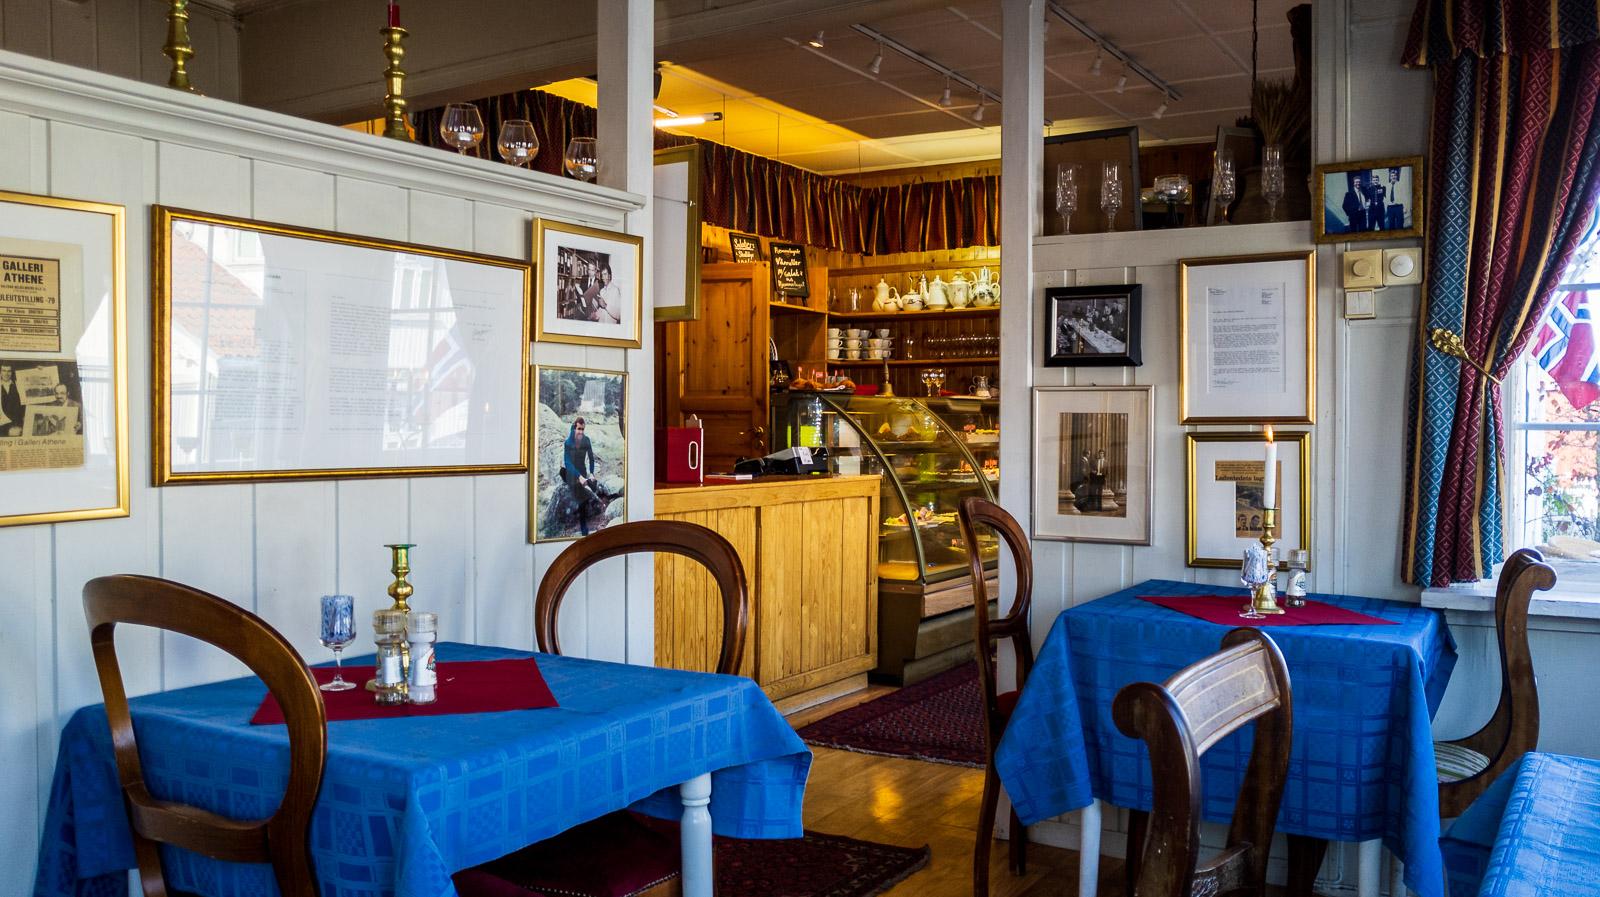 Inside Munchs Cafe, Åsgårdstrand.